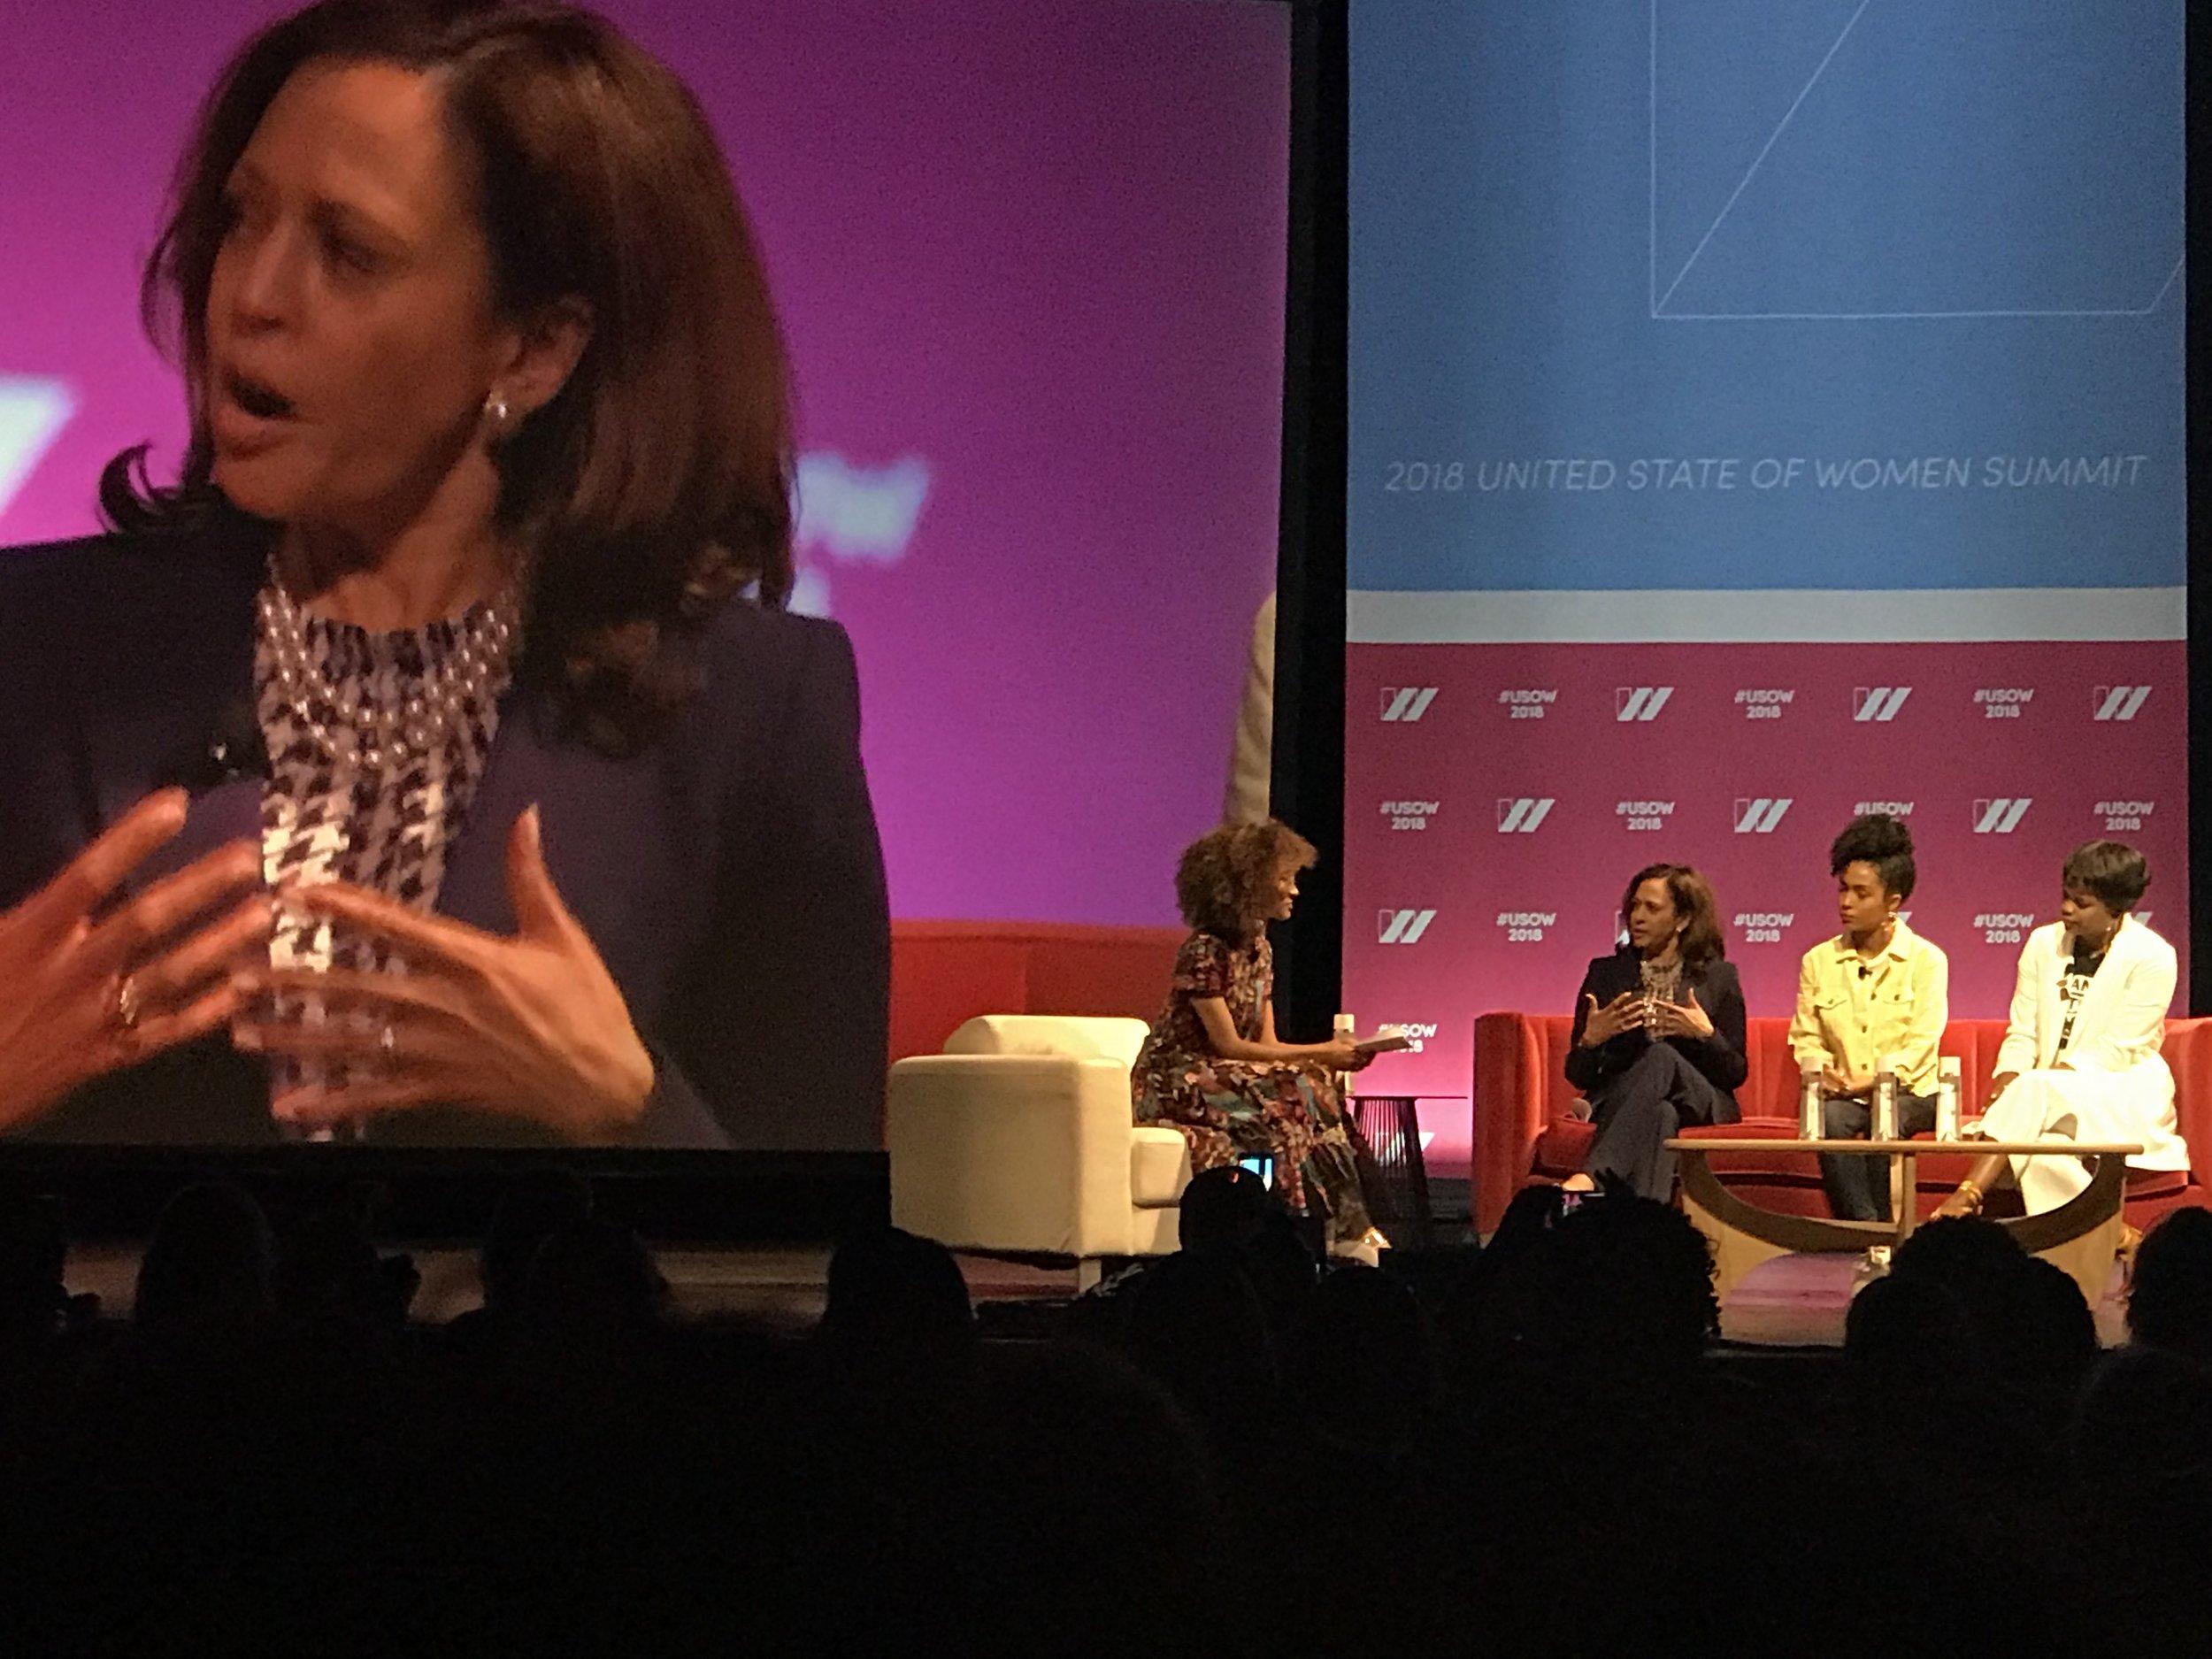 Elaine Welteroth, Senator Kamala Harris, Yara Shahidi, and Brittany Packnett